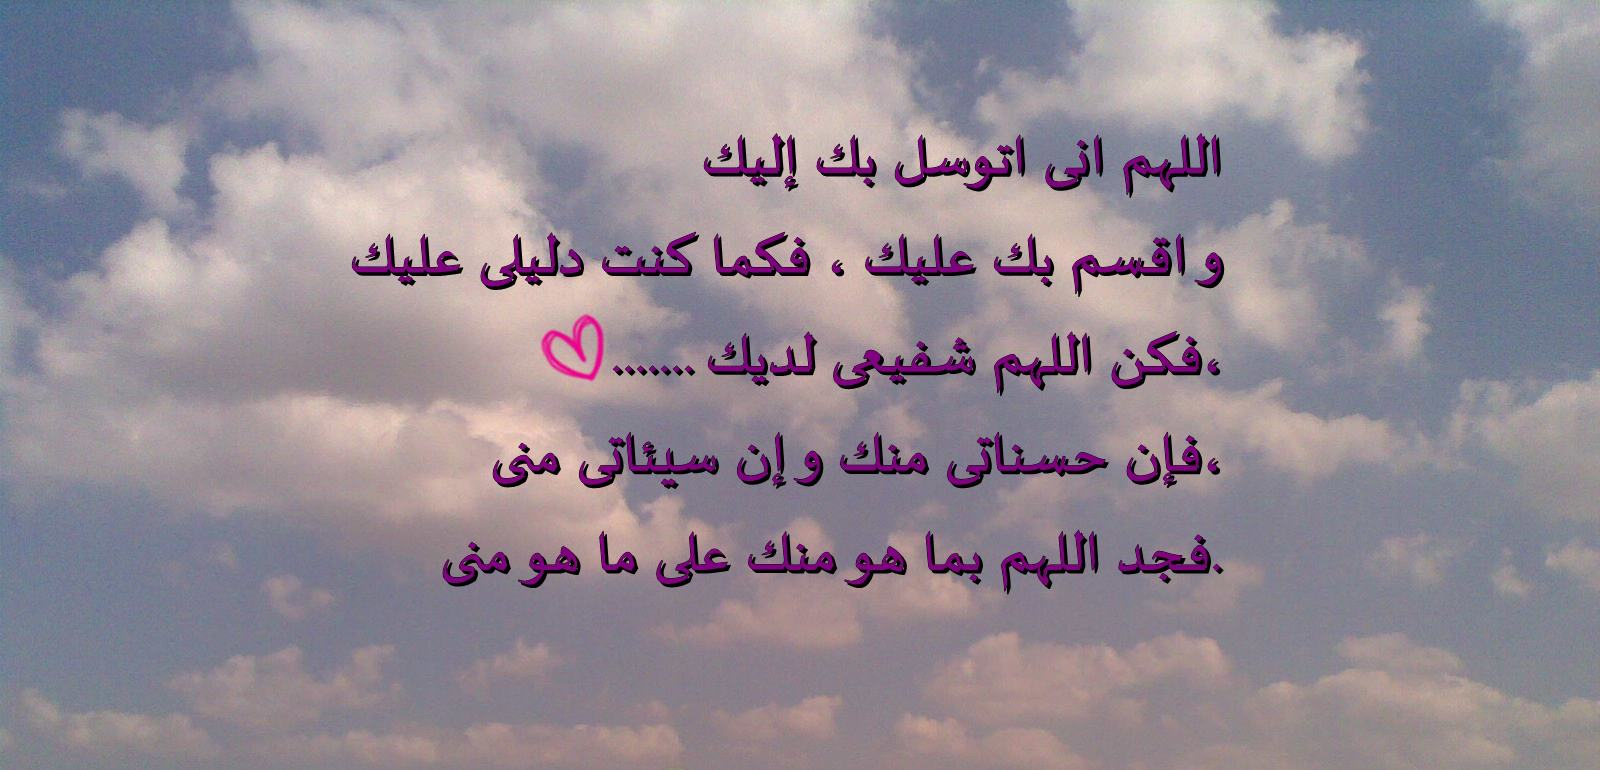 اغلفه ادعيه دينيه للفيس بوك 2019 كفرات اسلاميه جديده 2019